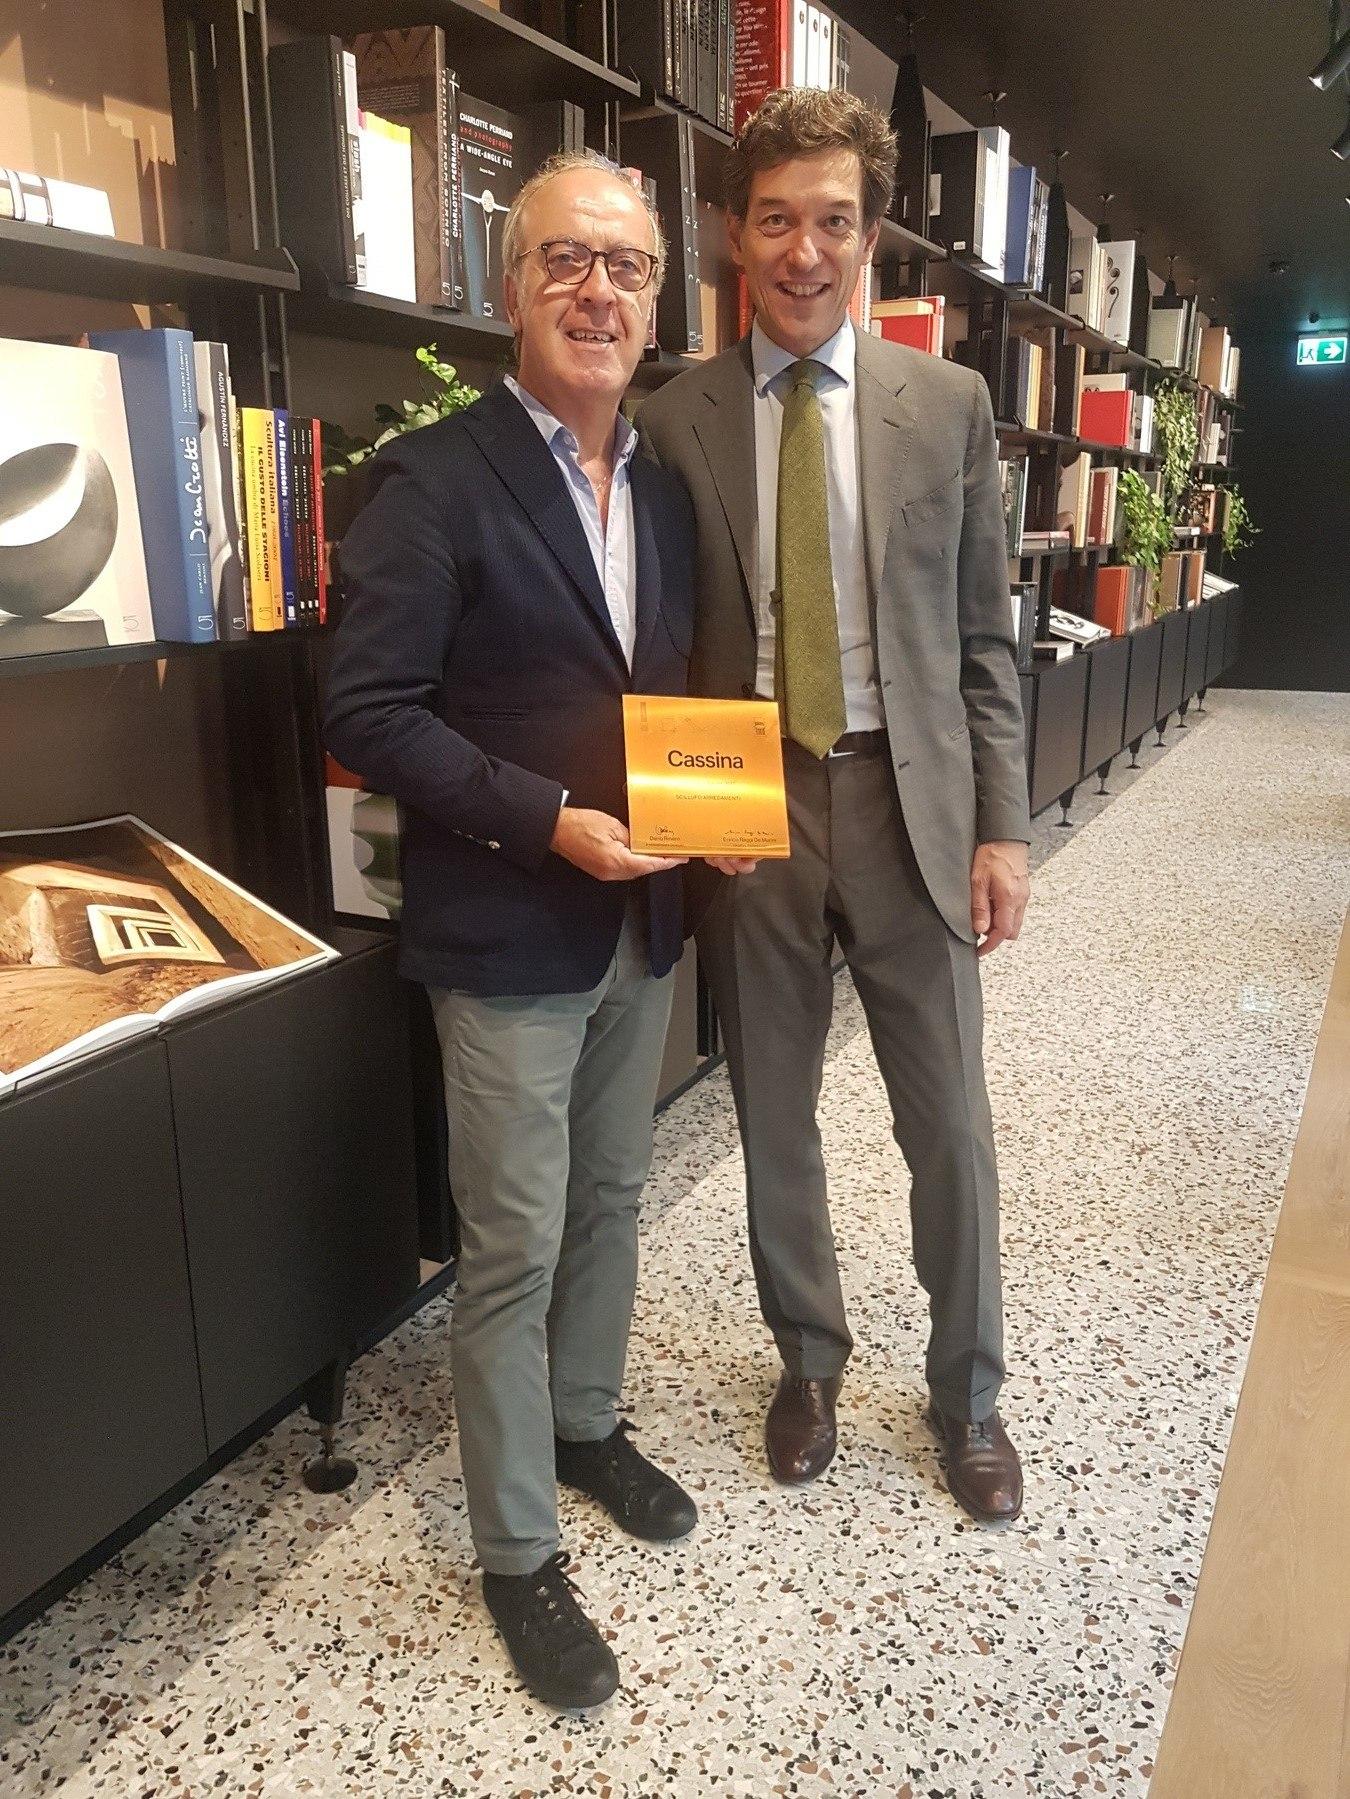 giuseppe scillufo - enrico raggi - cassina best italian dealer 2017 scillufo arredamenti